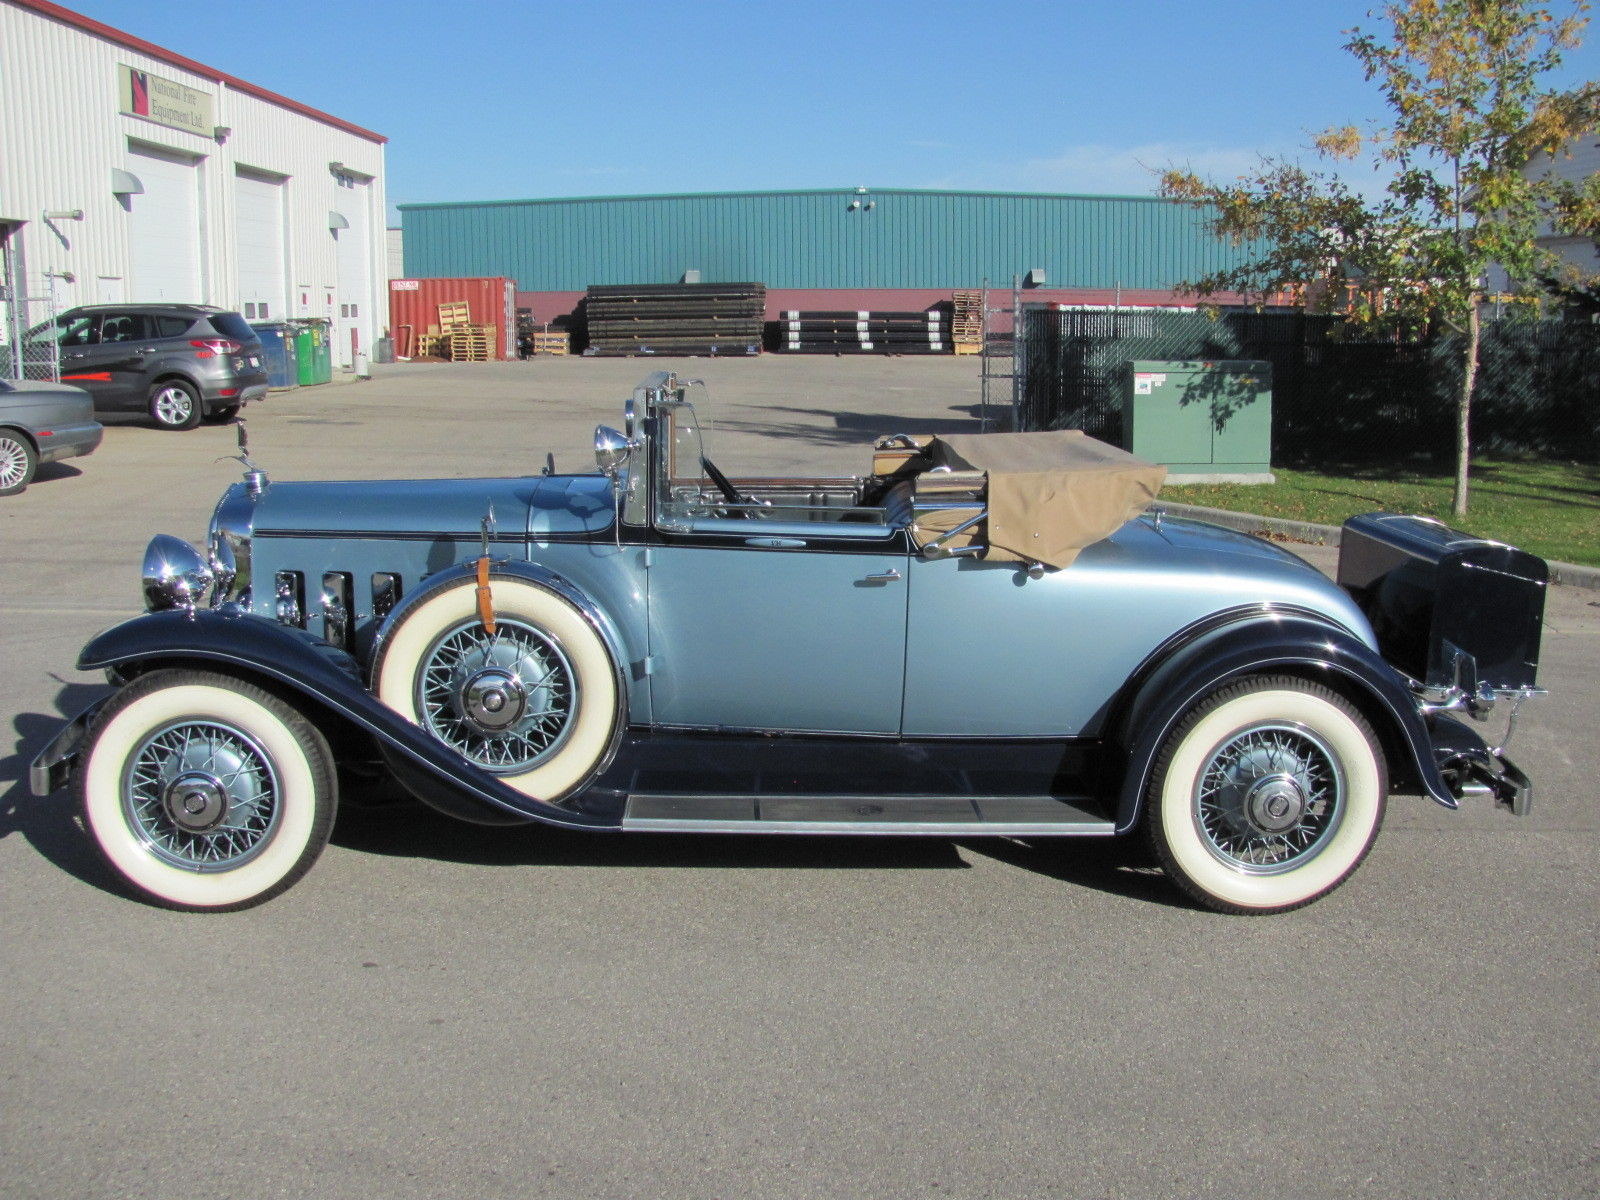 Rare CCCA Full Classic 30's Roadster Vintage Antique Car